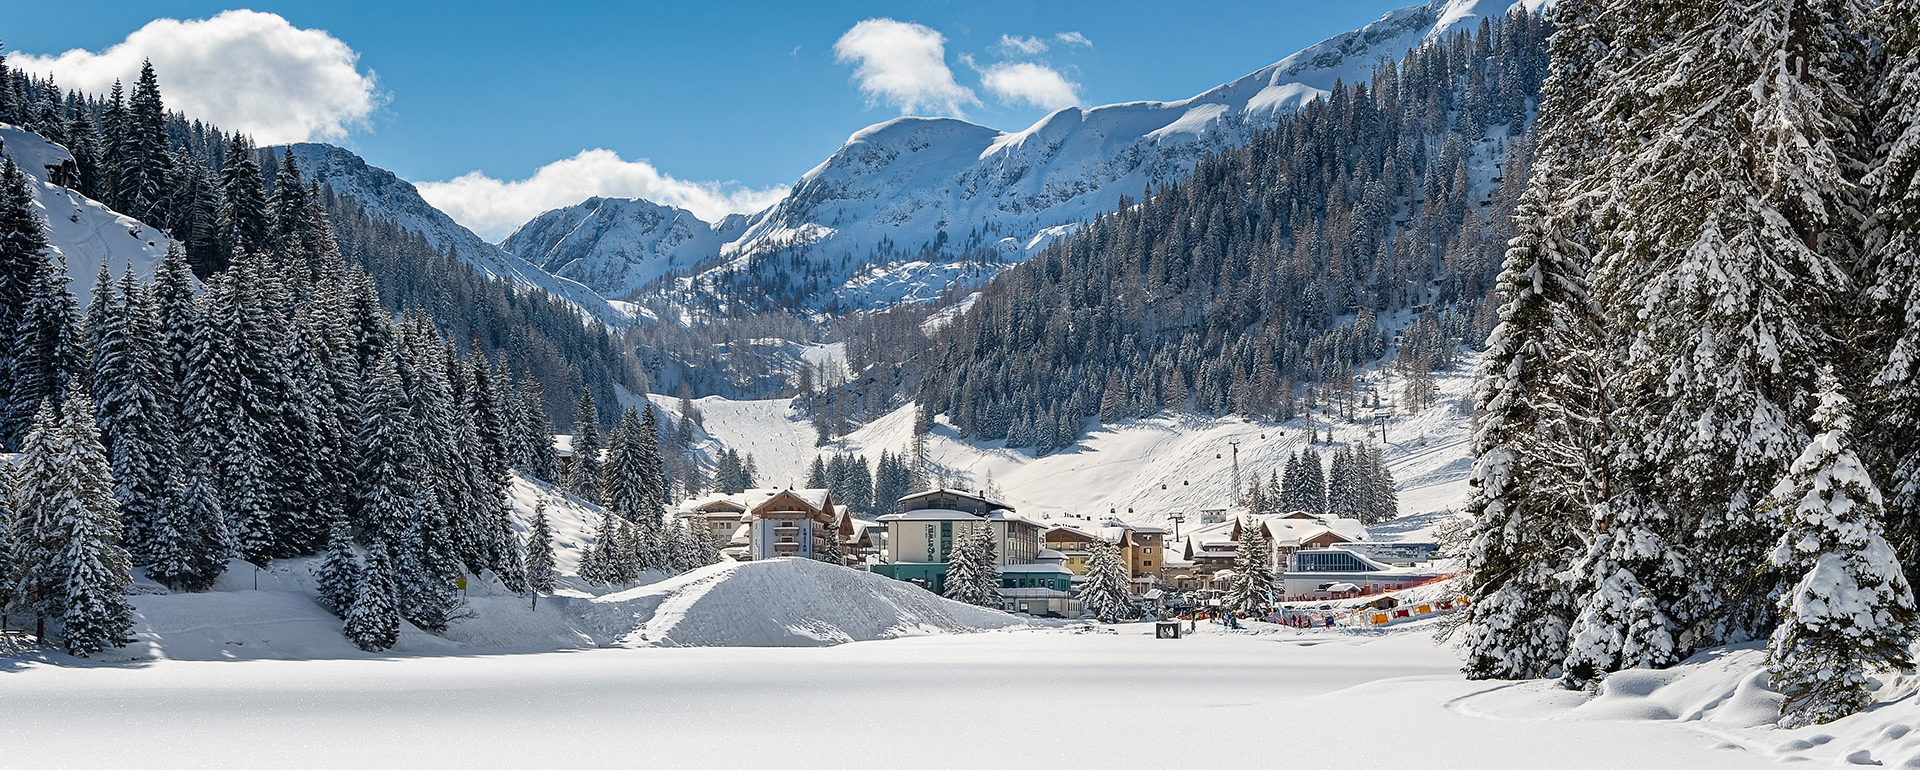 Toplage - Skiurlaub in Zauchensee